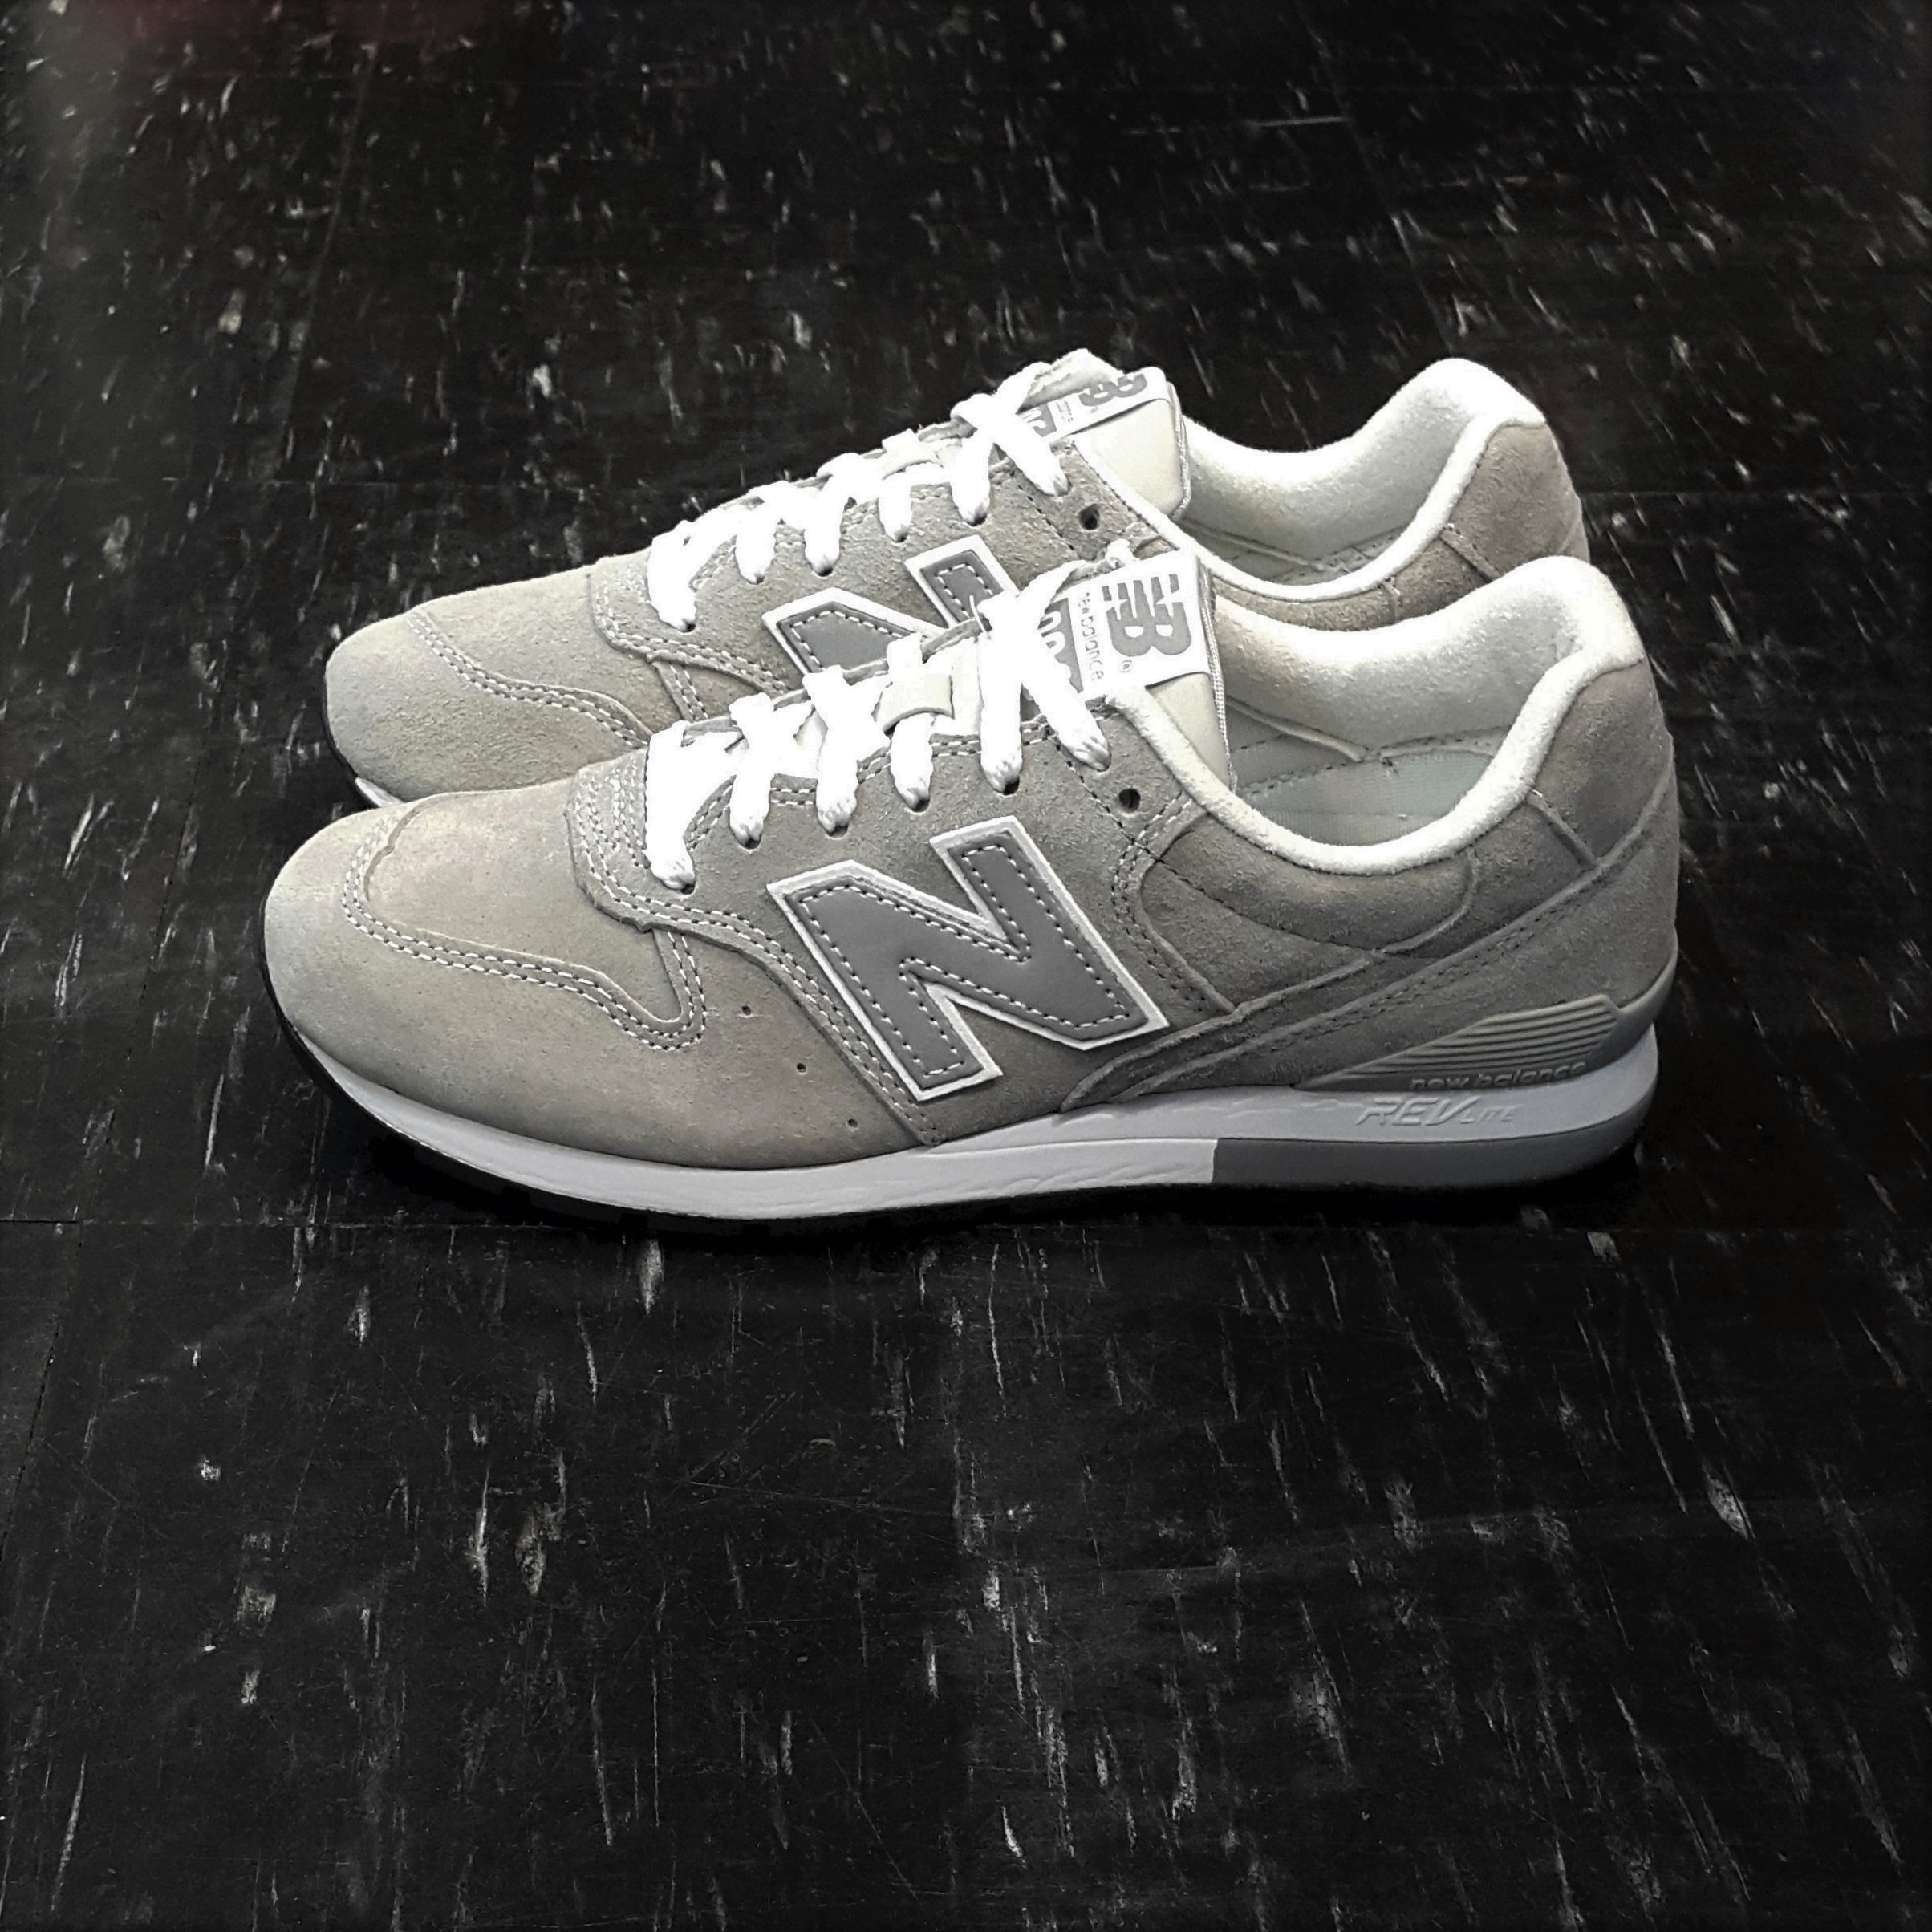 new balance nb 996 MRL996DG 灰色 淺灰色 元祖灰 經典款 麂皮 網布 質感 慢跑鞋